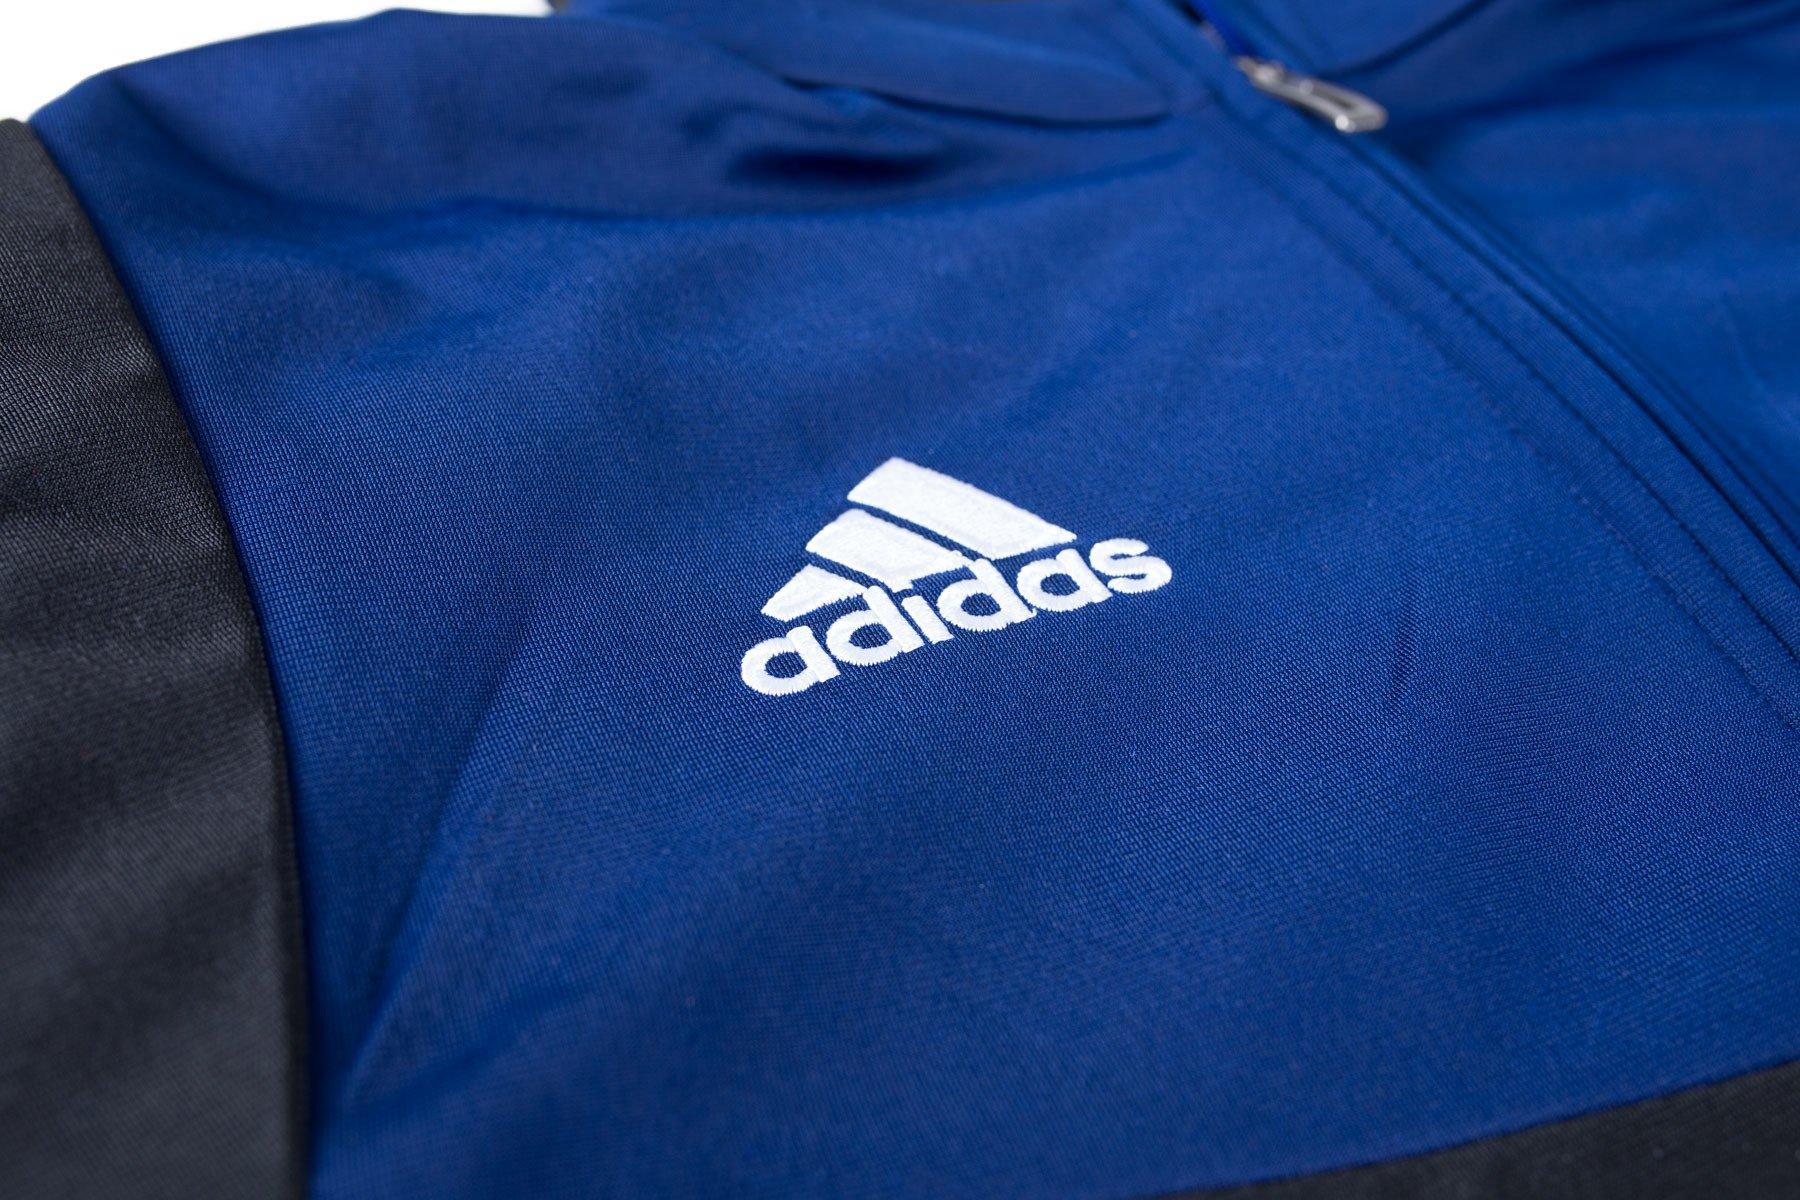 Bluza męska Adidas, granatowa ADIDAS TIRO 19 PES JKT